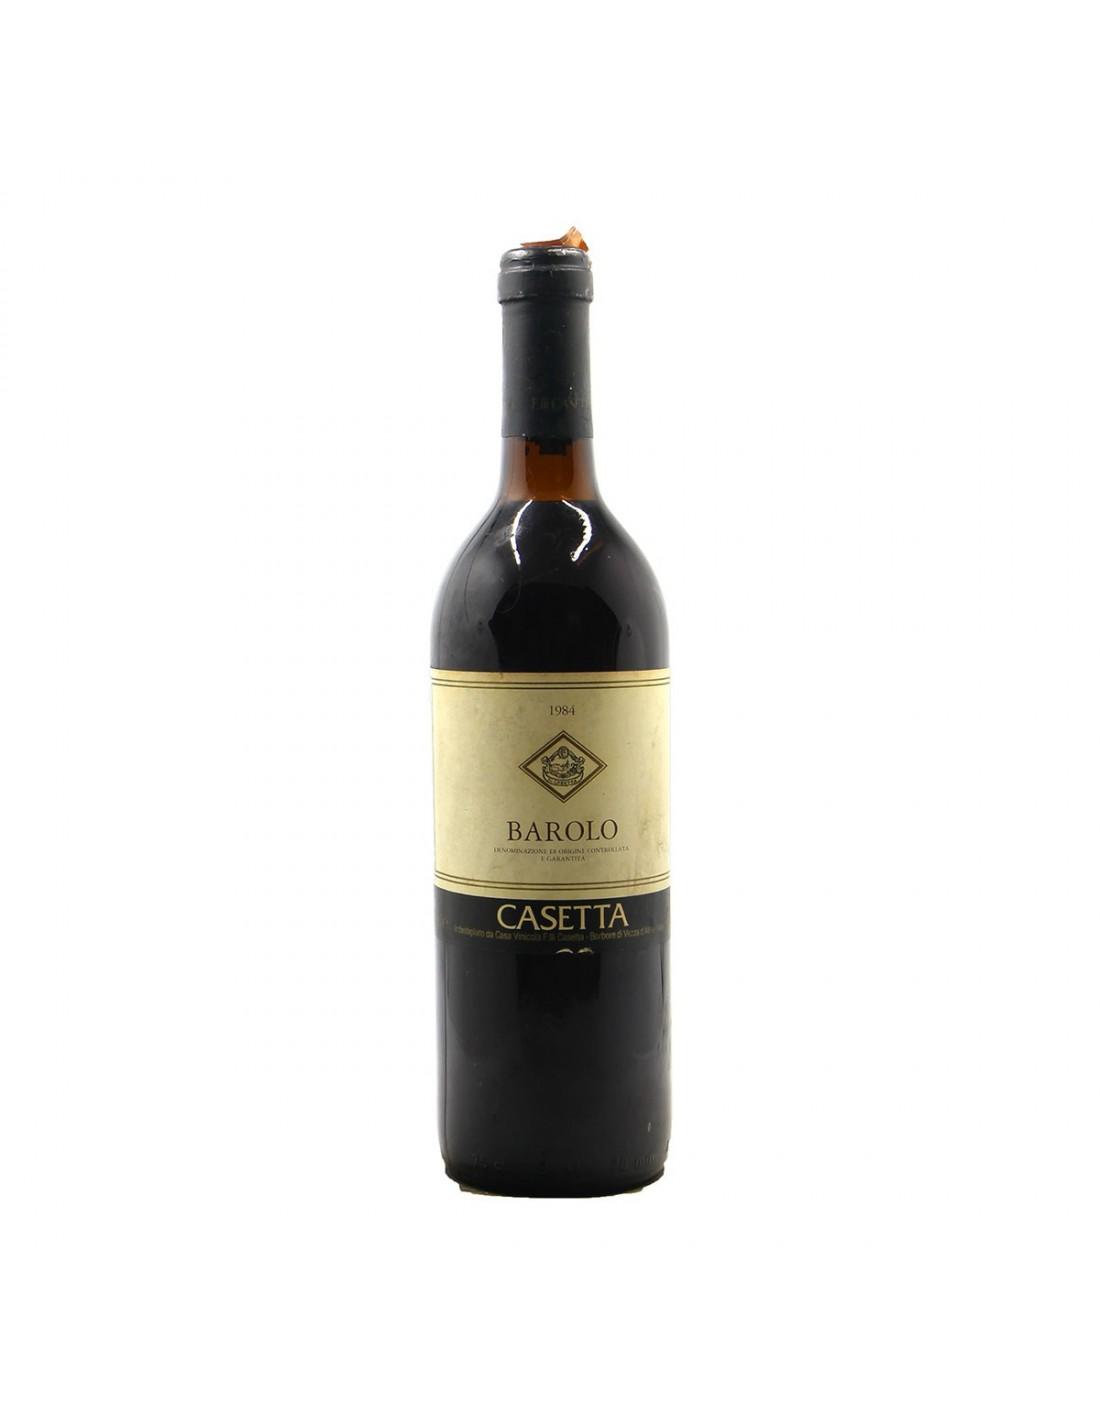 BAROLO 1984 CASETTA Grandi Bottiglie